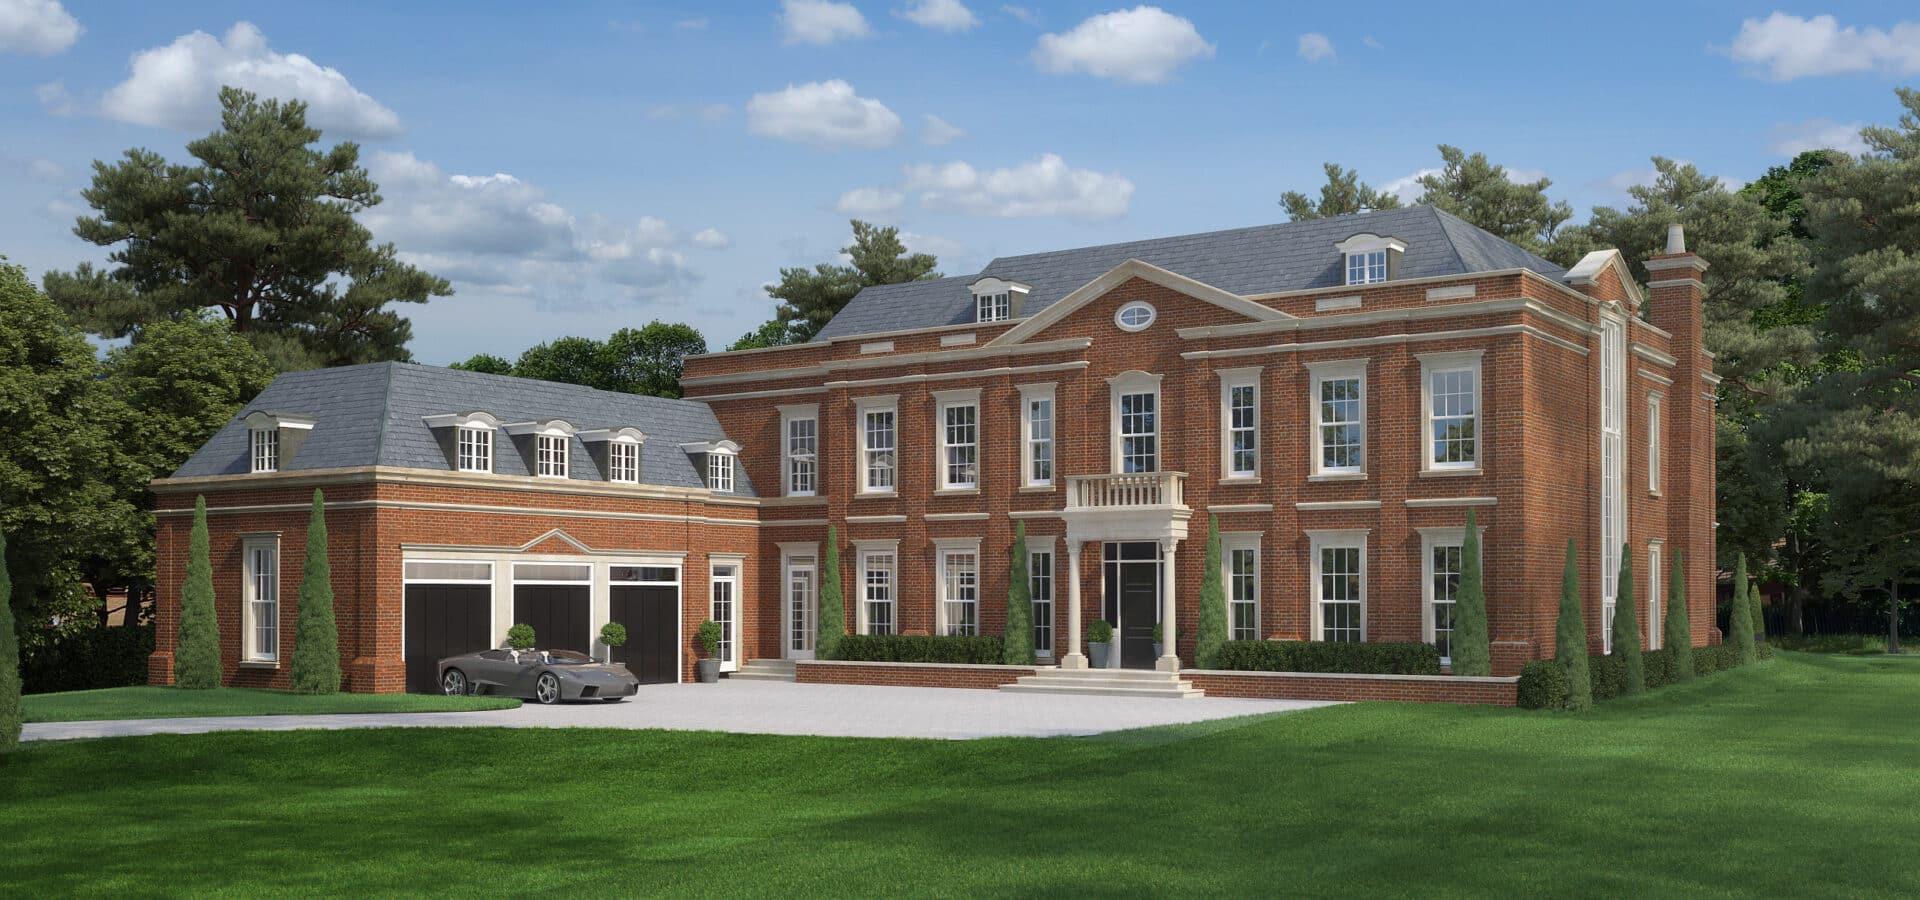 Sunningdale Manor